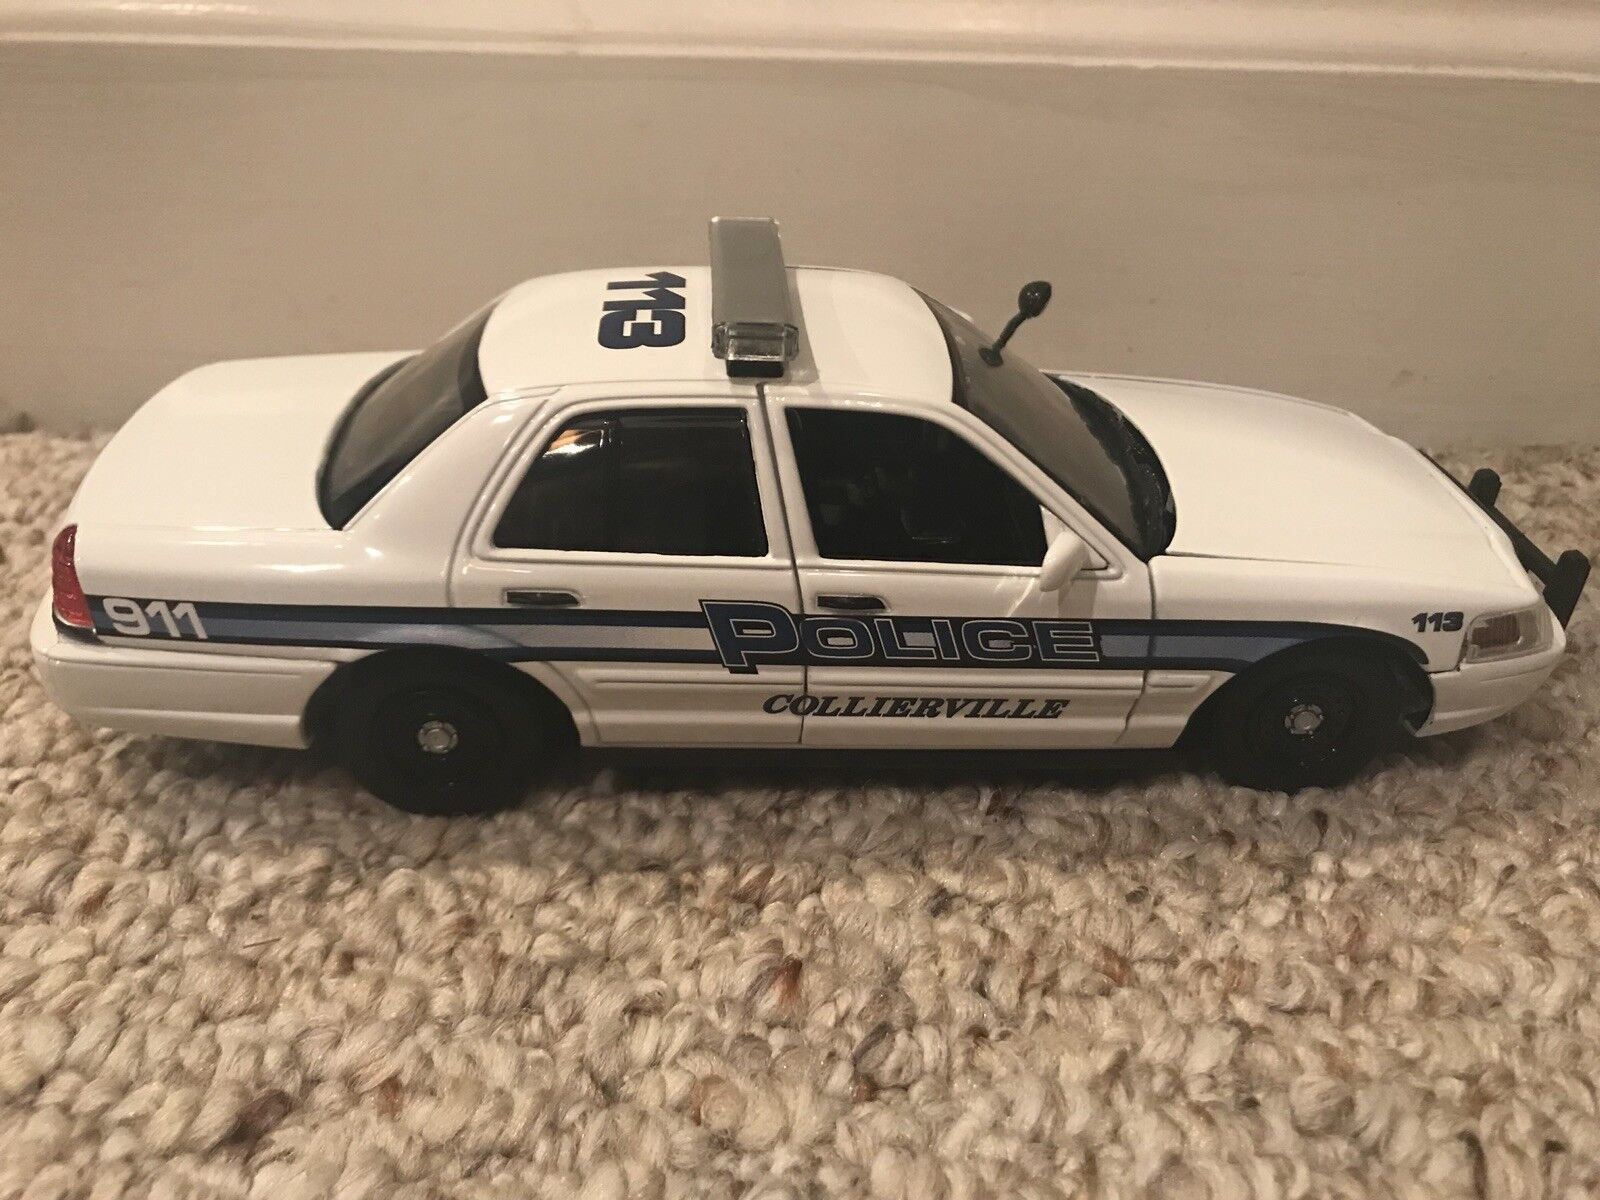 Collierville Tennessee Tennessee Tennessee Police Department diecast car 1 24 scale Ford Crown Vic 91e28e